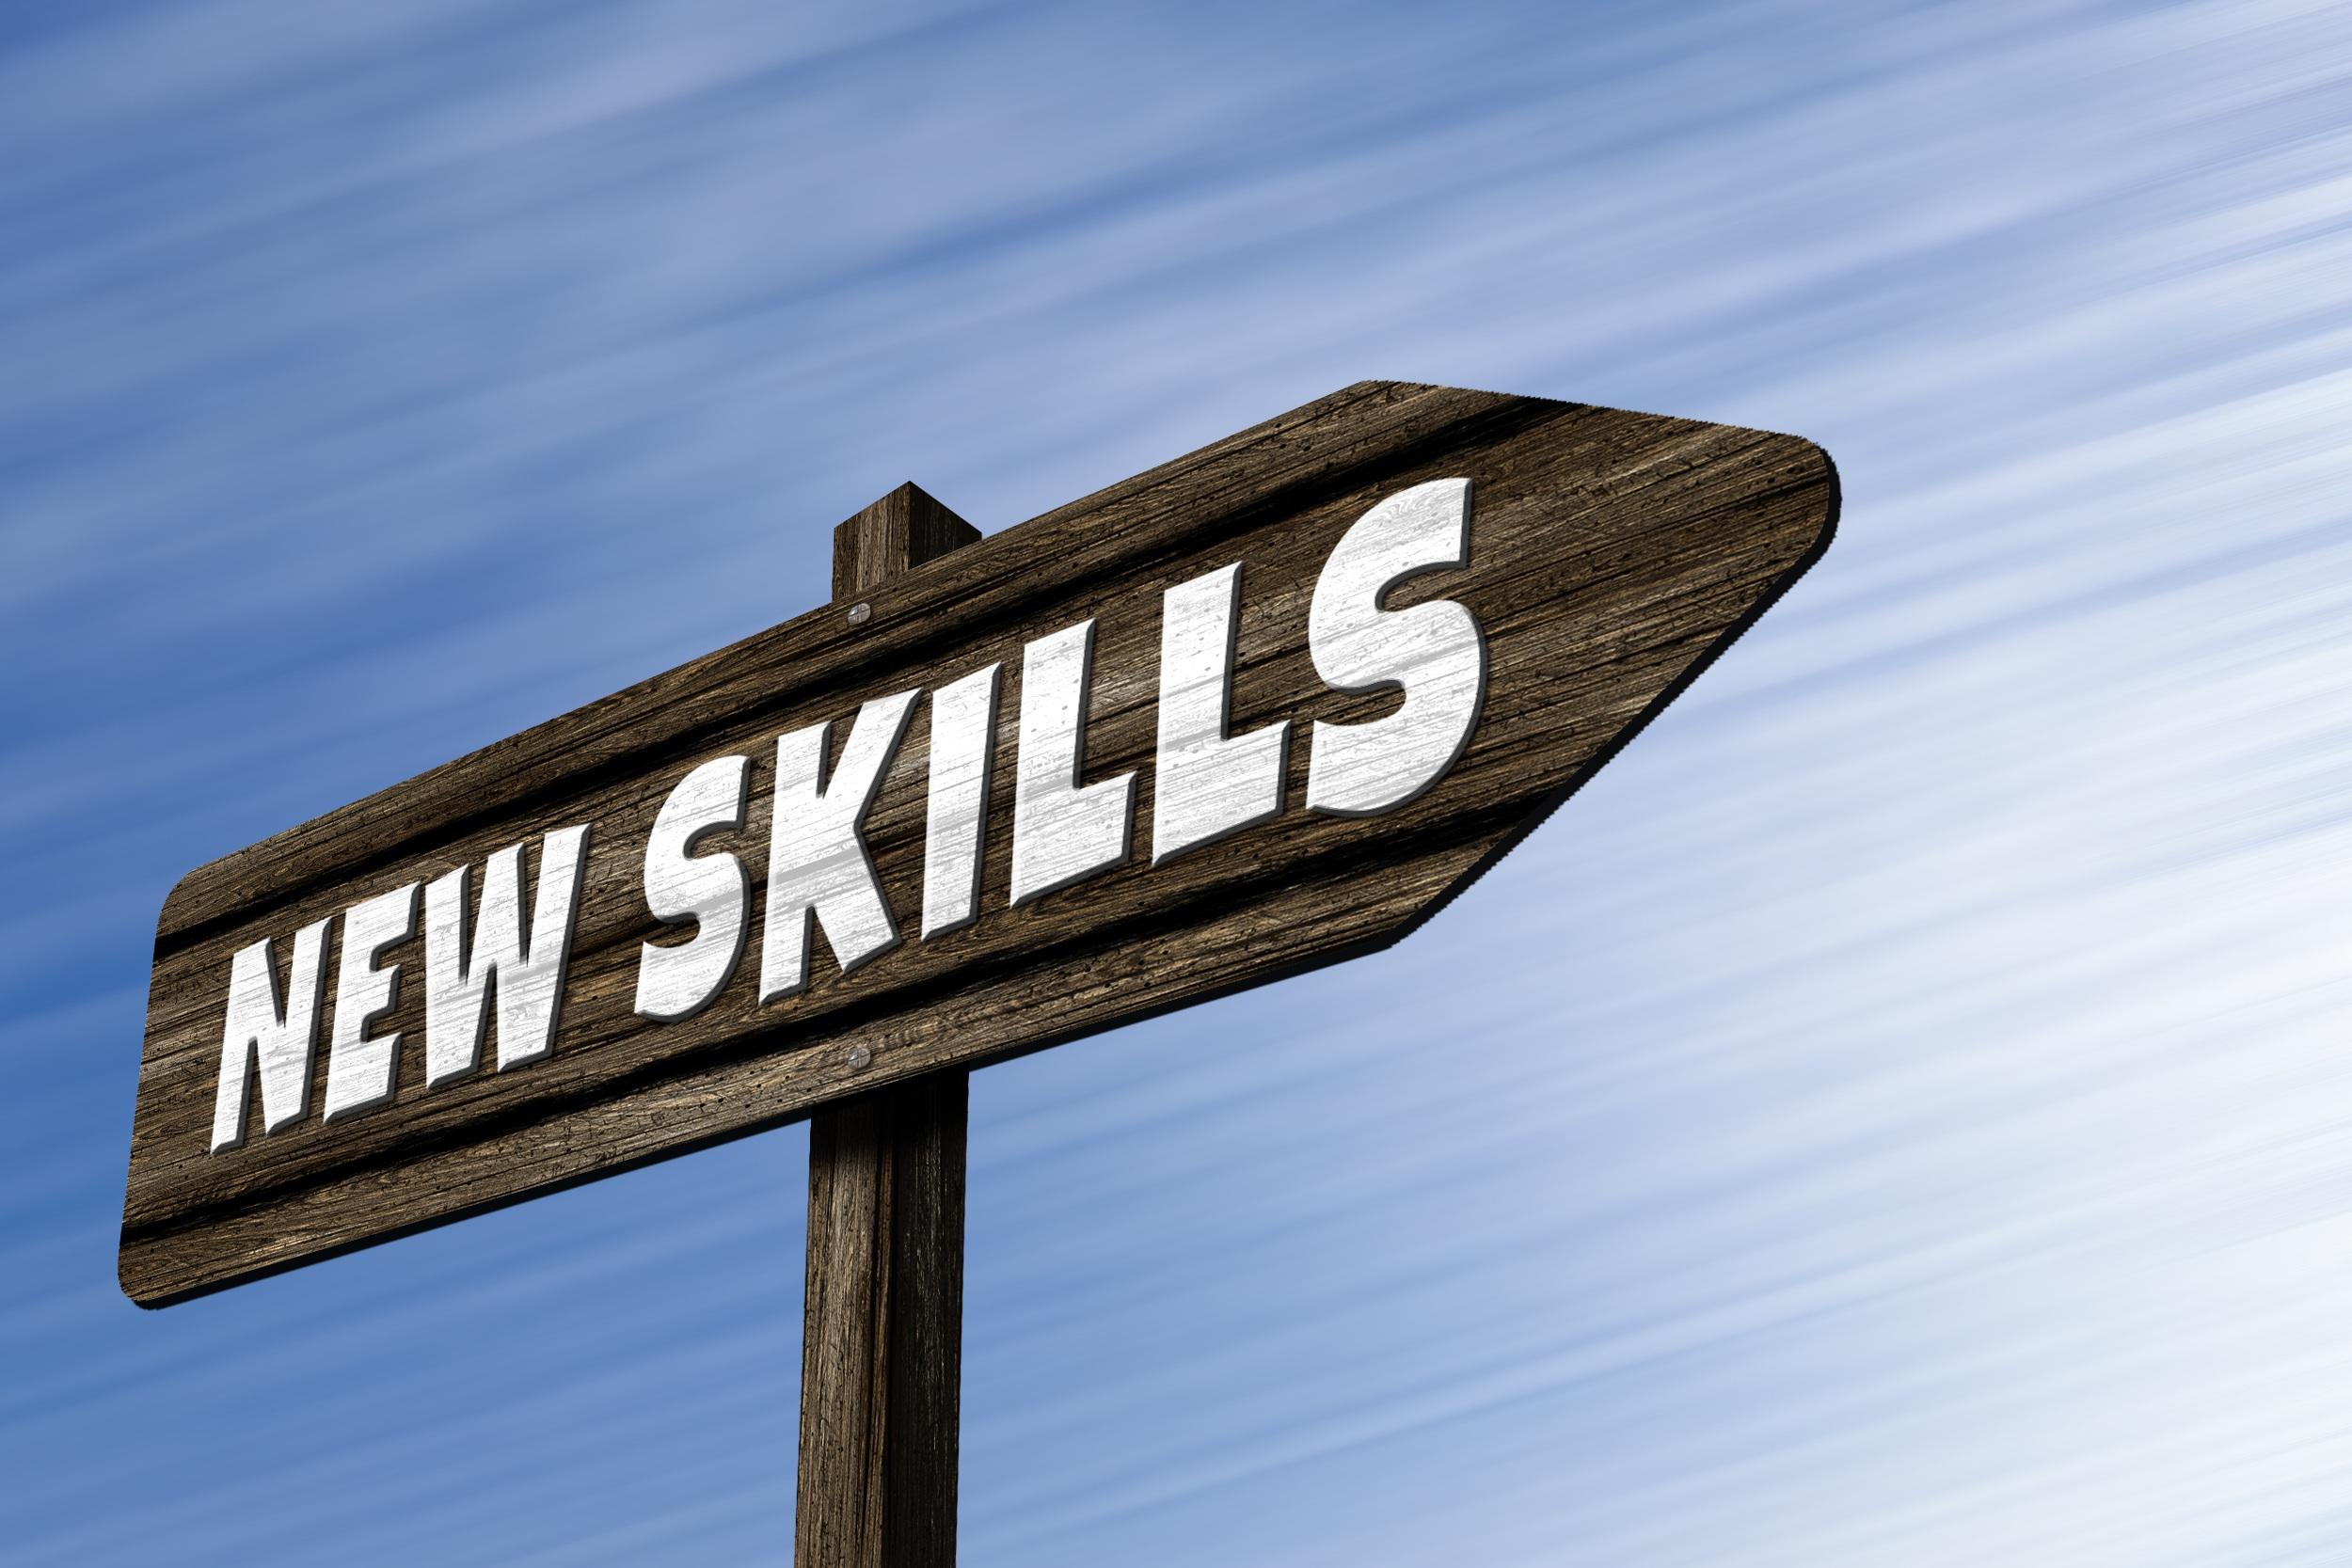 computer skills coaching riehl help skills coaching